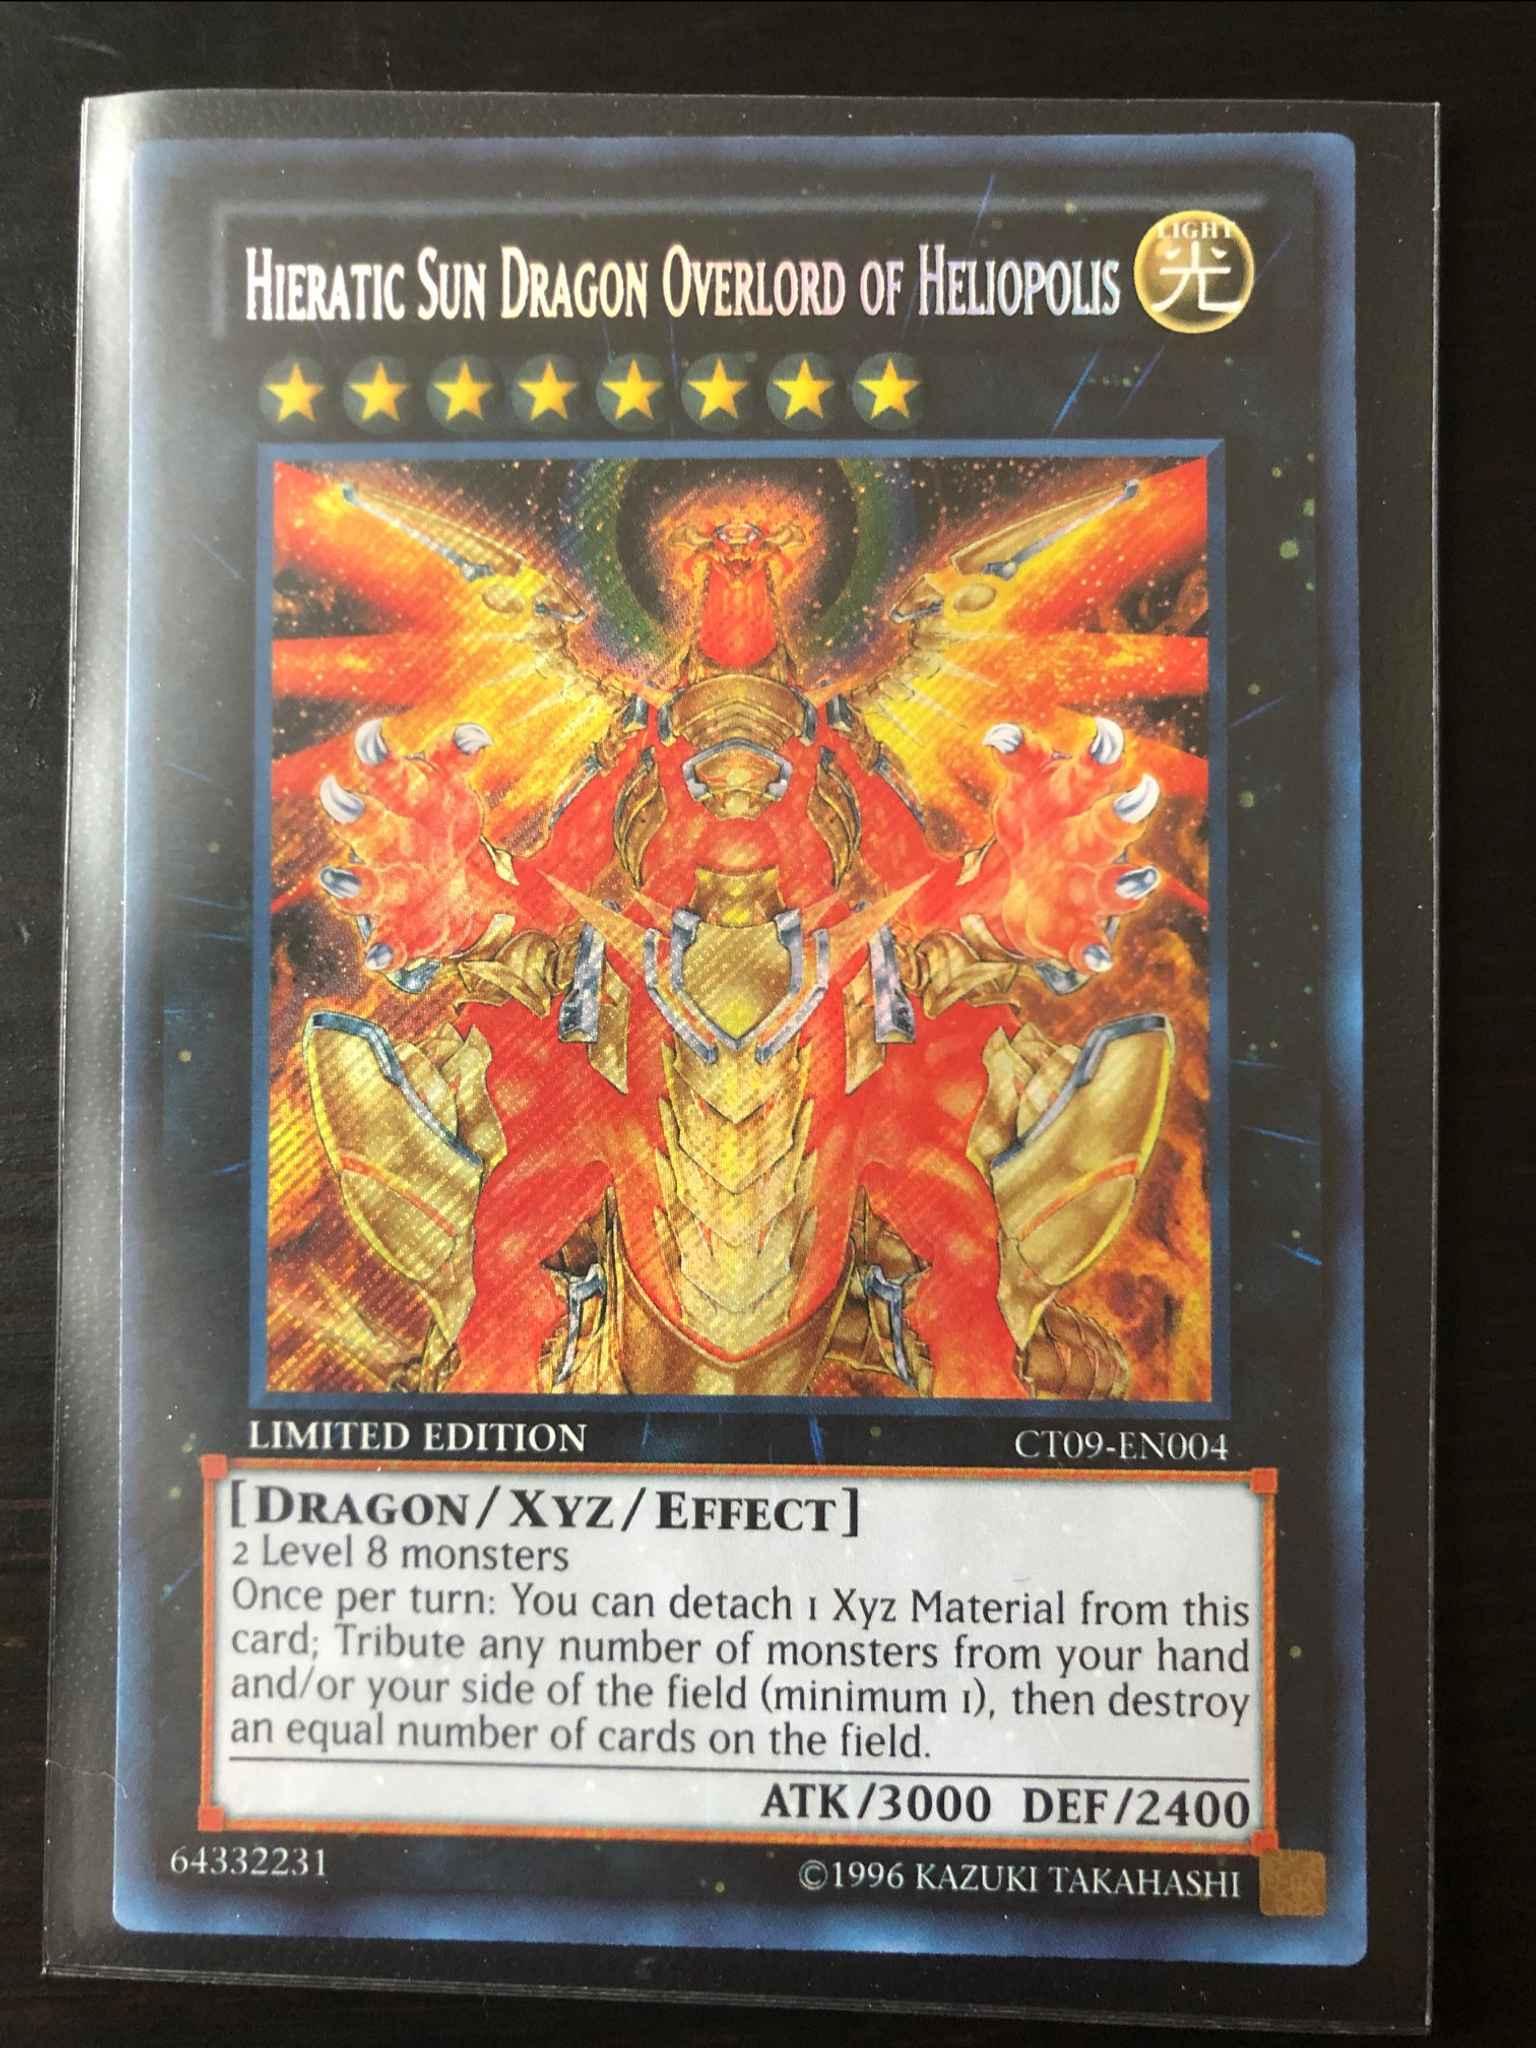 Hieratic Sun Dragon Overlord of Heliopolis Limited Secret Rare CT09-EN004